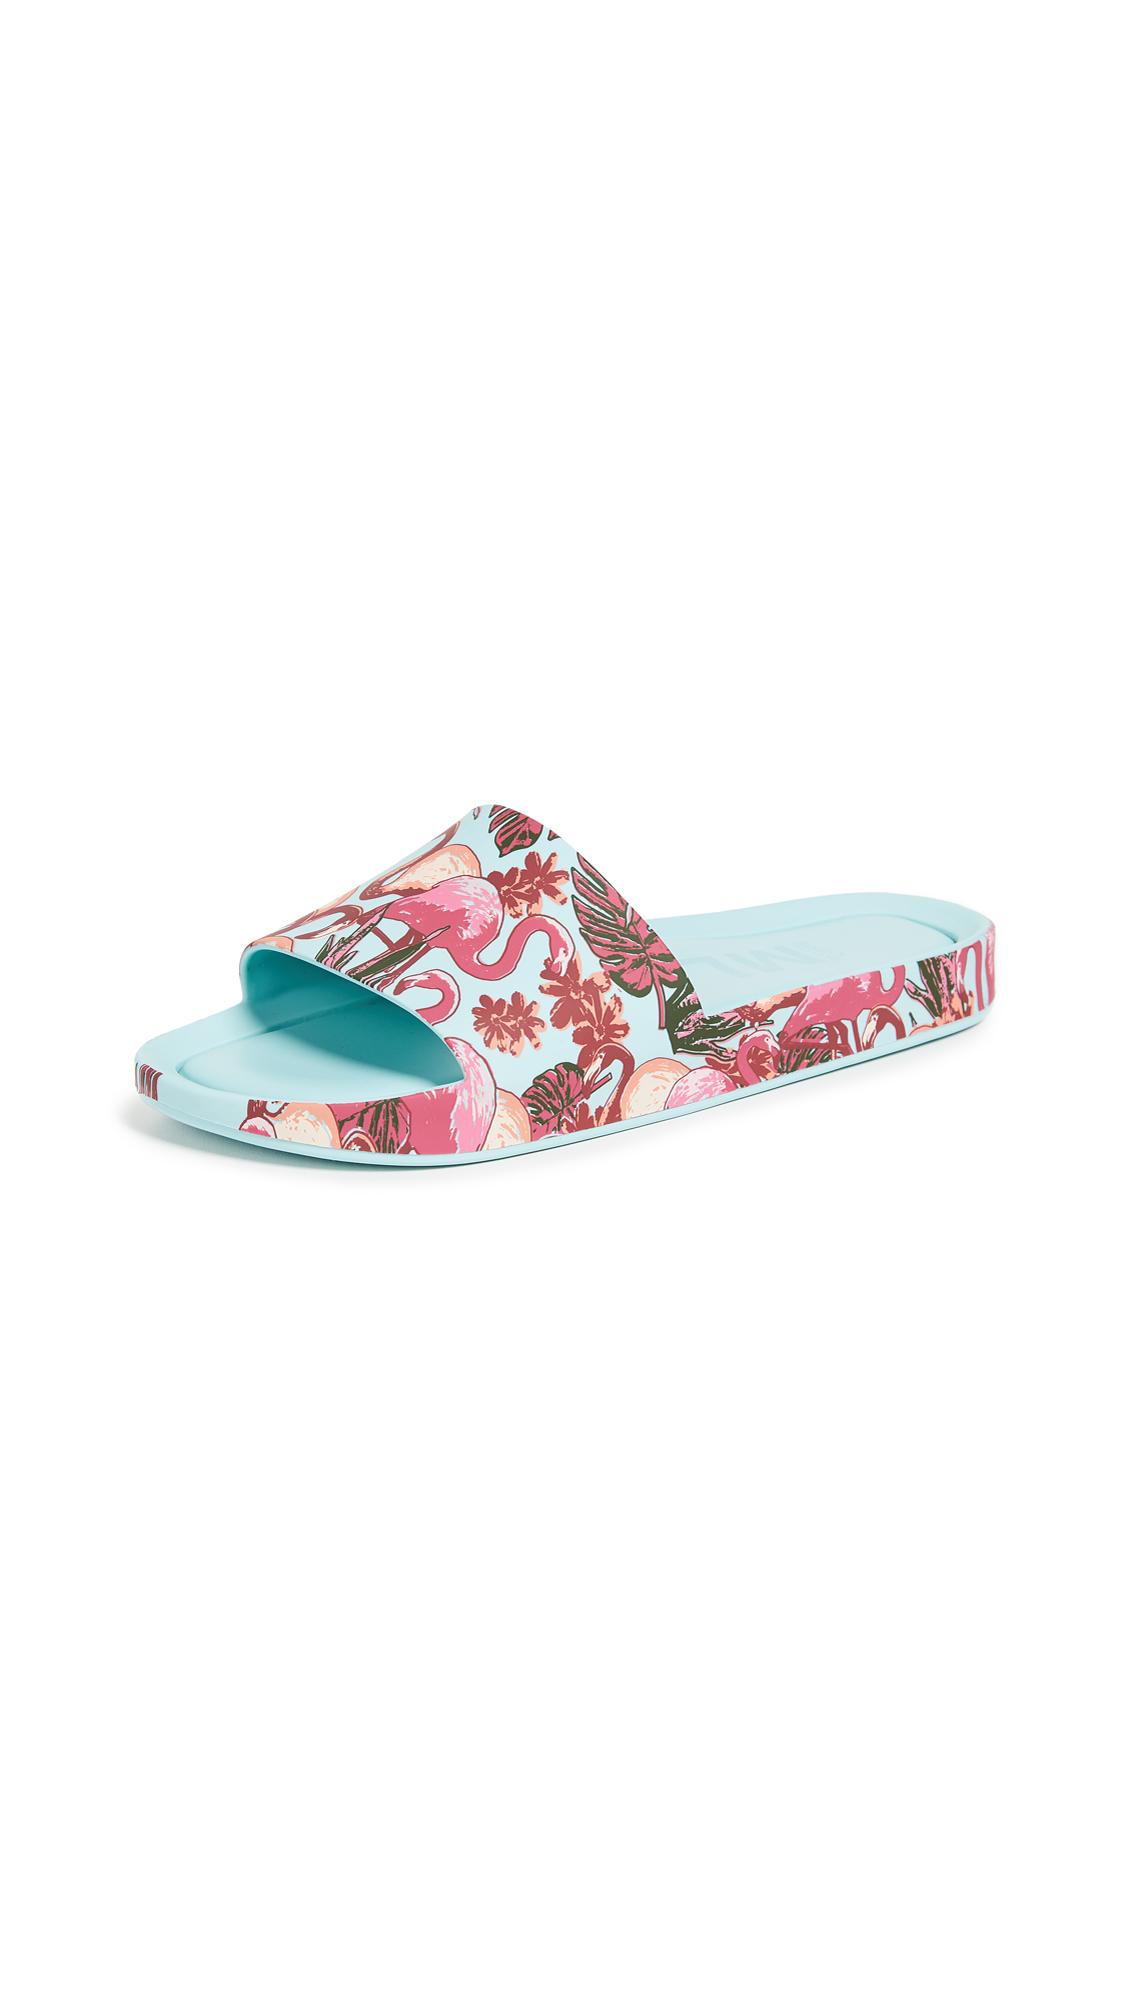 Melissa Beach Rain Slide Sandals - Light Green/Multi